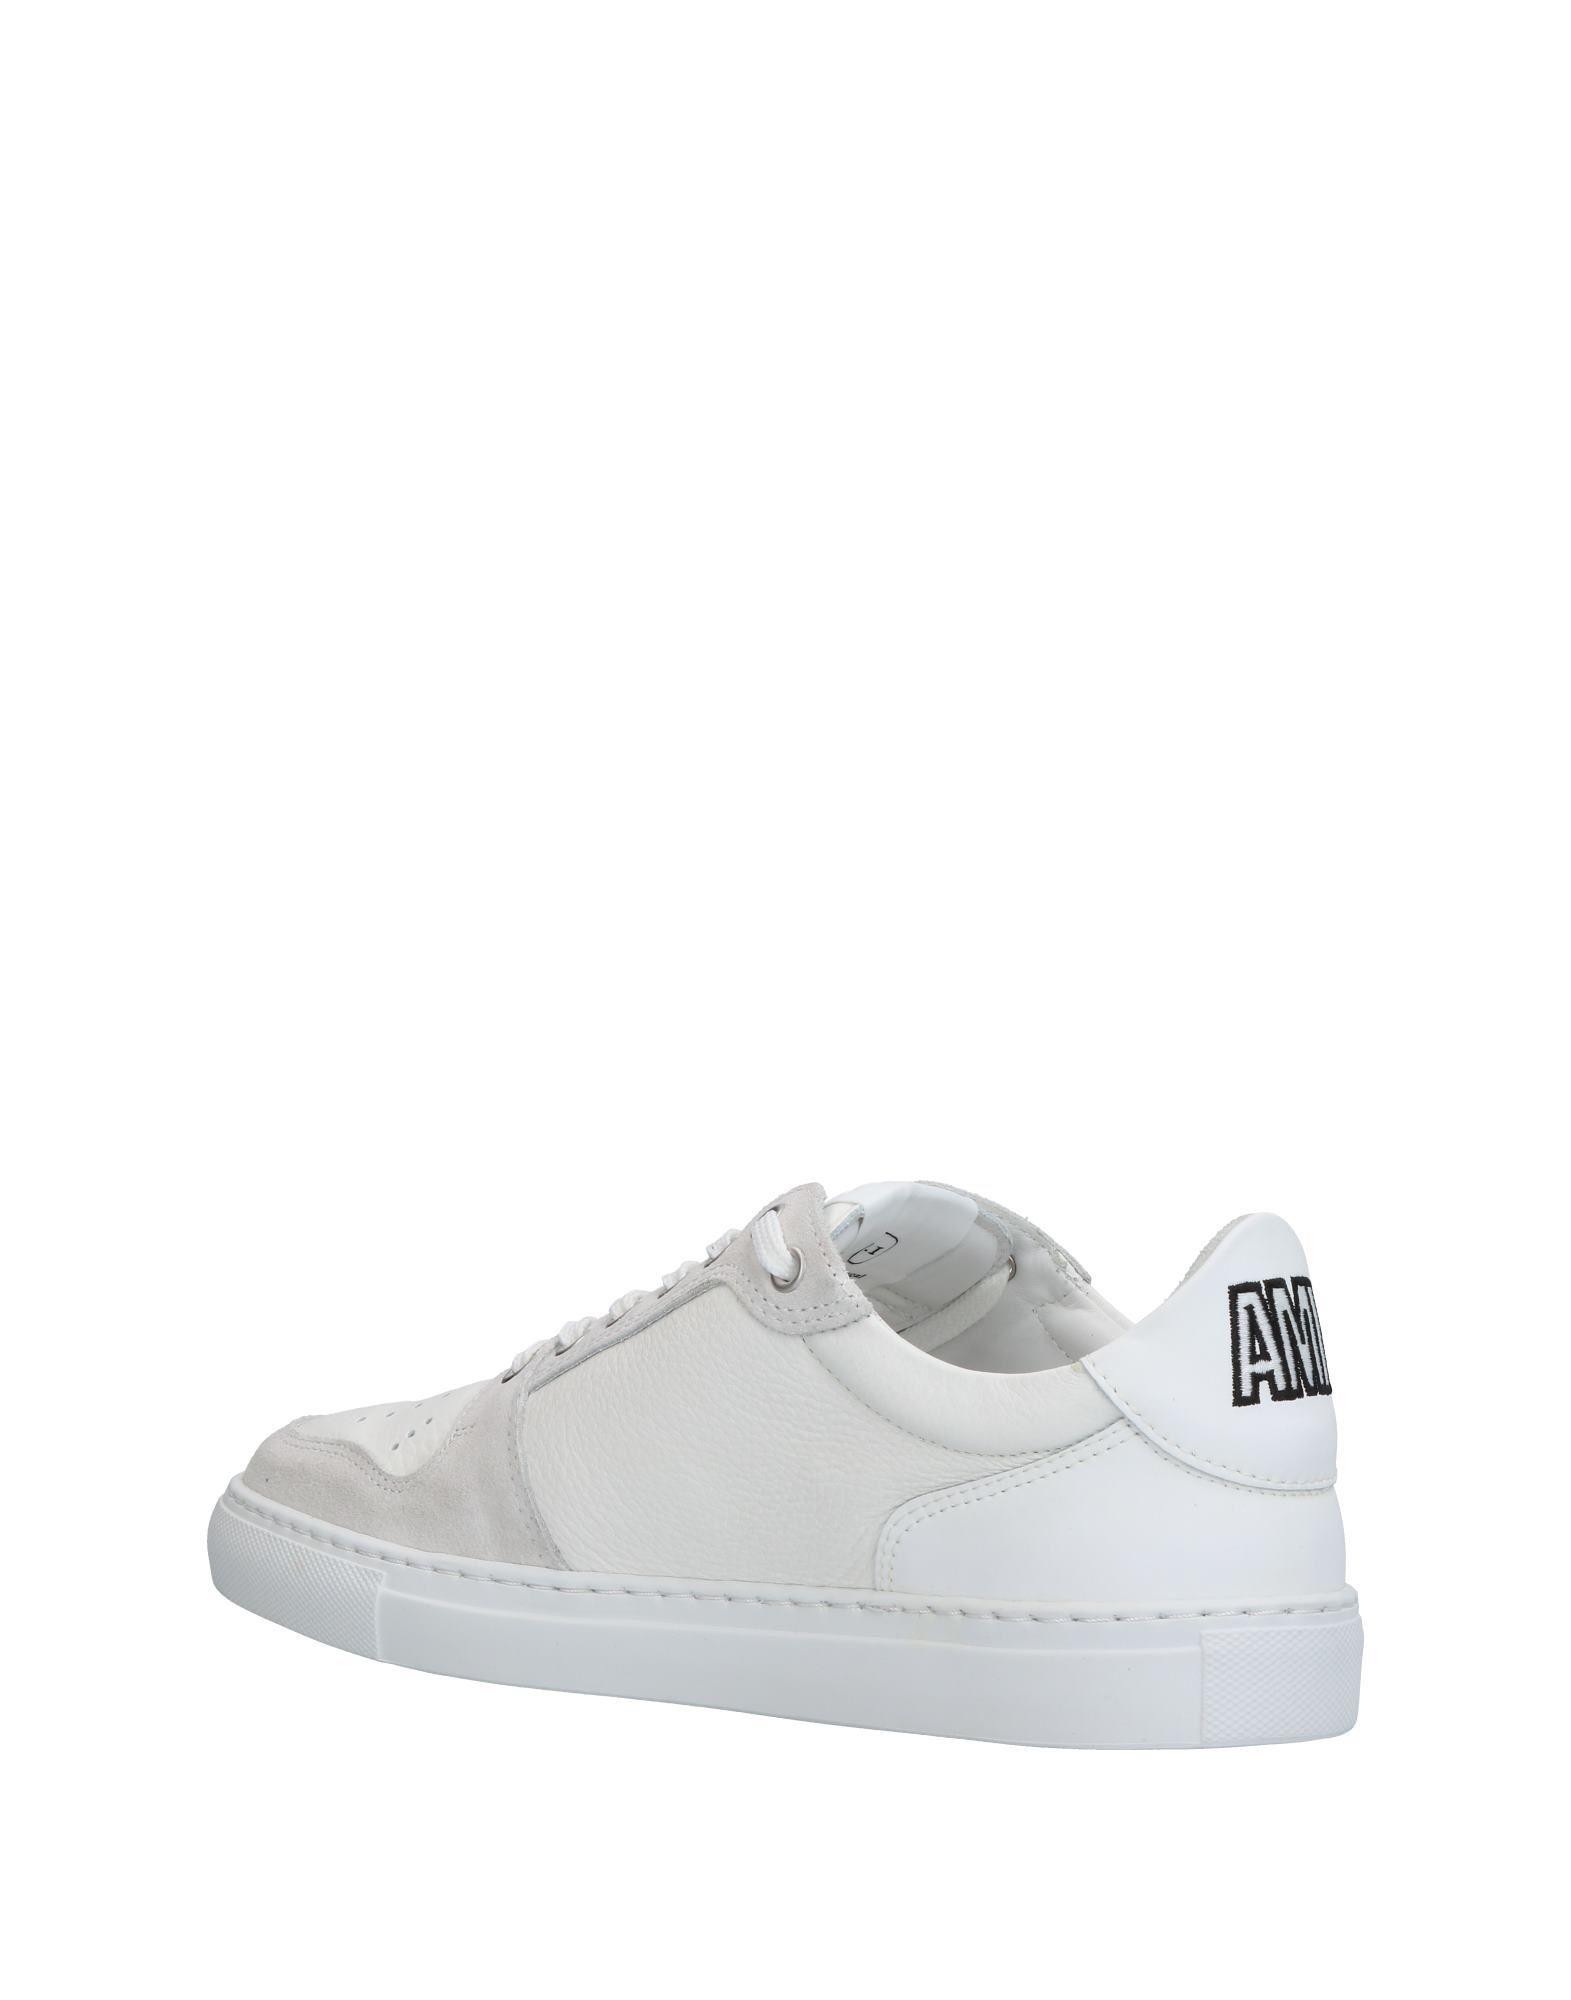 Ami Alexandre Mattiussi Sneakers Herren  11364966TC Gute Qualität beliebte Schuhe